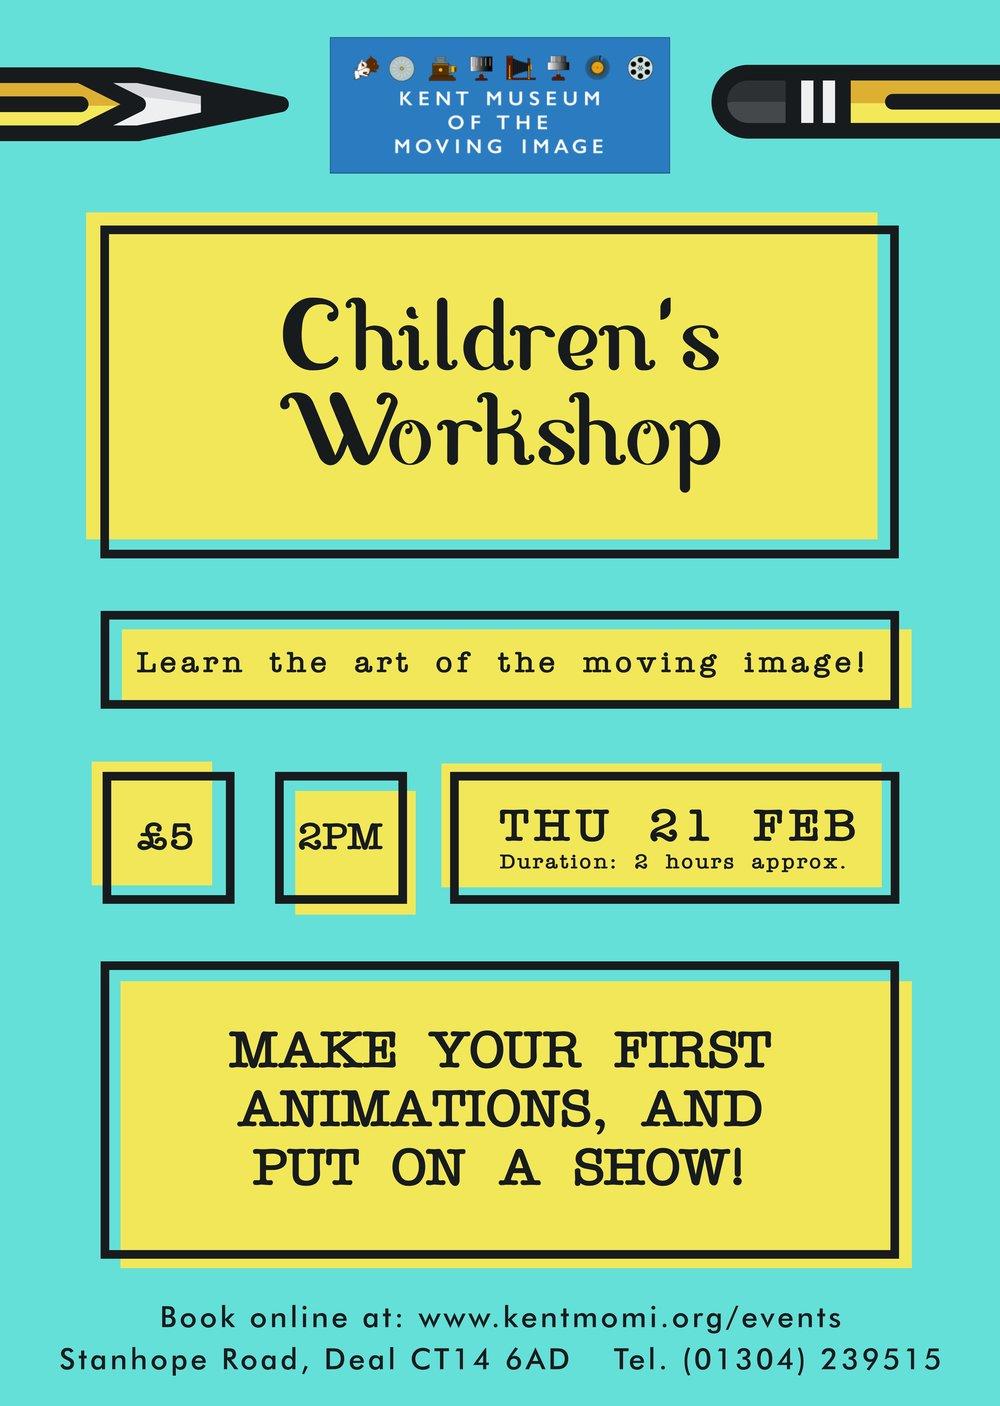 Children's Workshop Details Yet to be Confirmed Poster.jpg